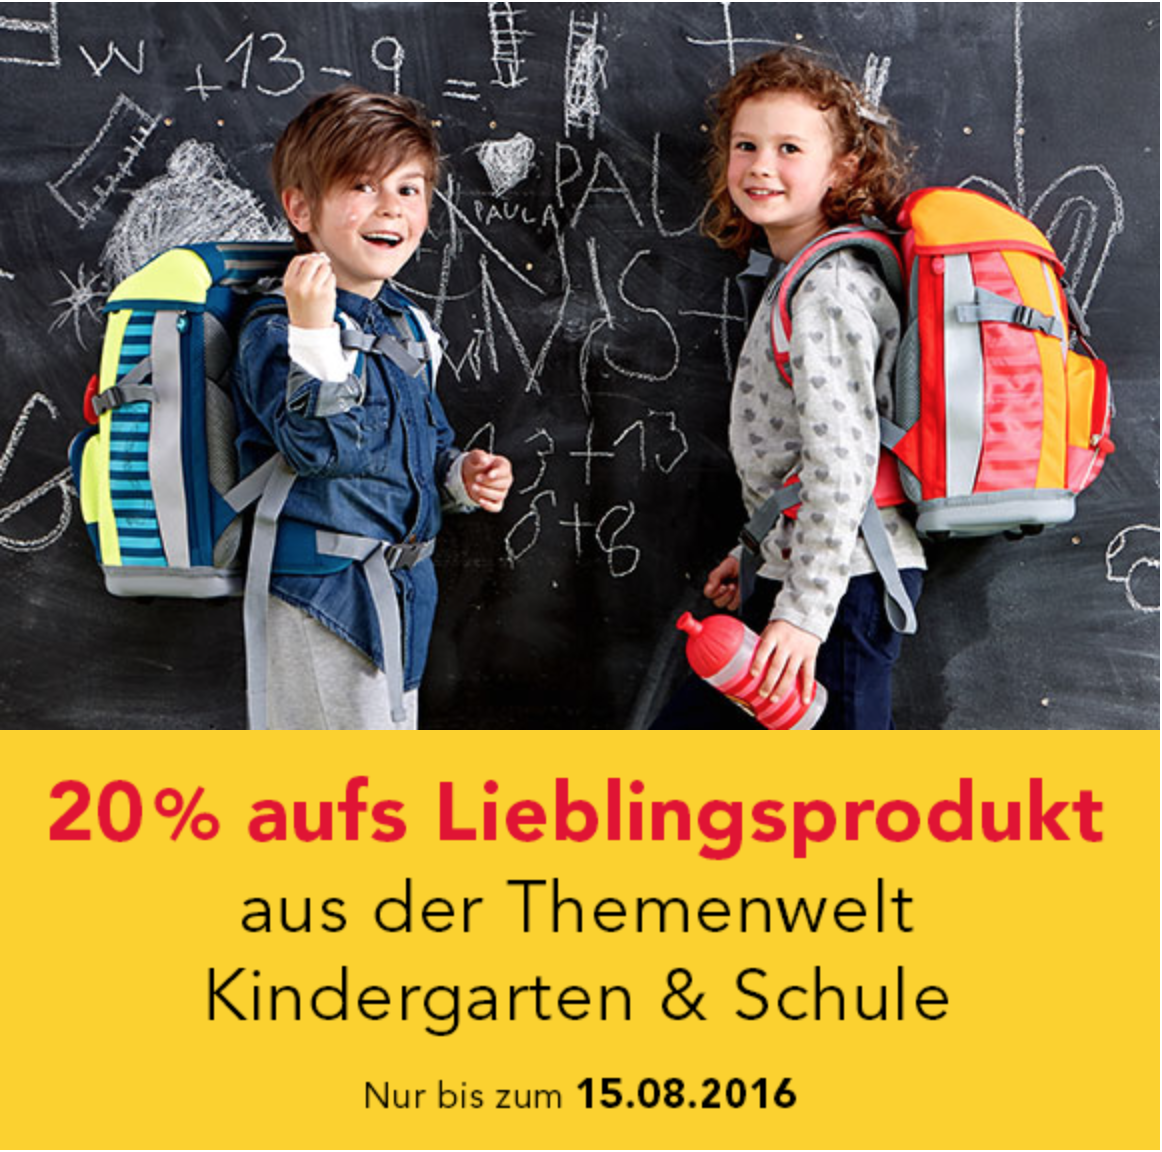 Zum Start von Kindergarten & Schule bei jako-o.de - 20% Rabatt